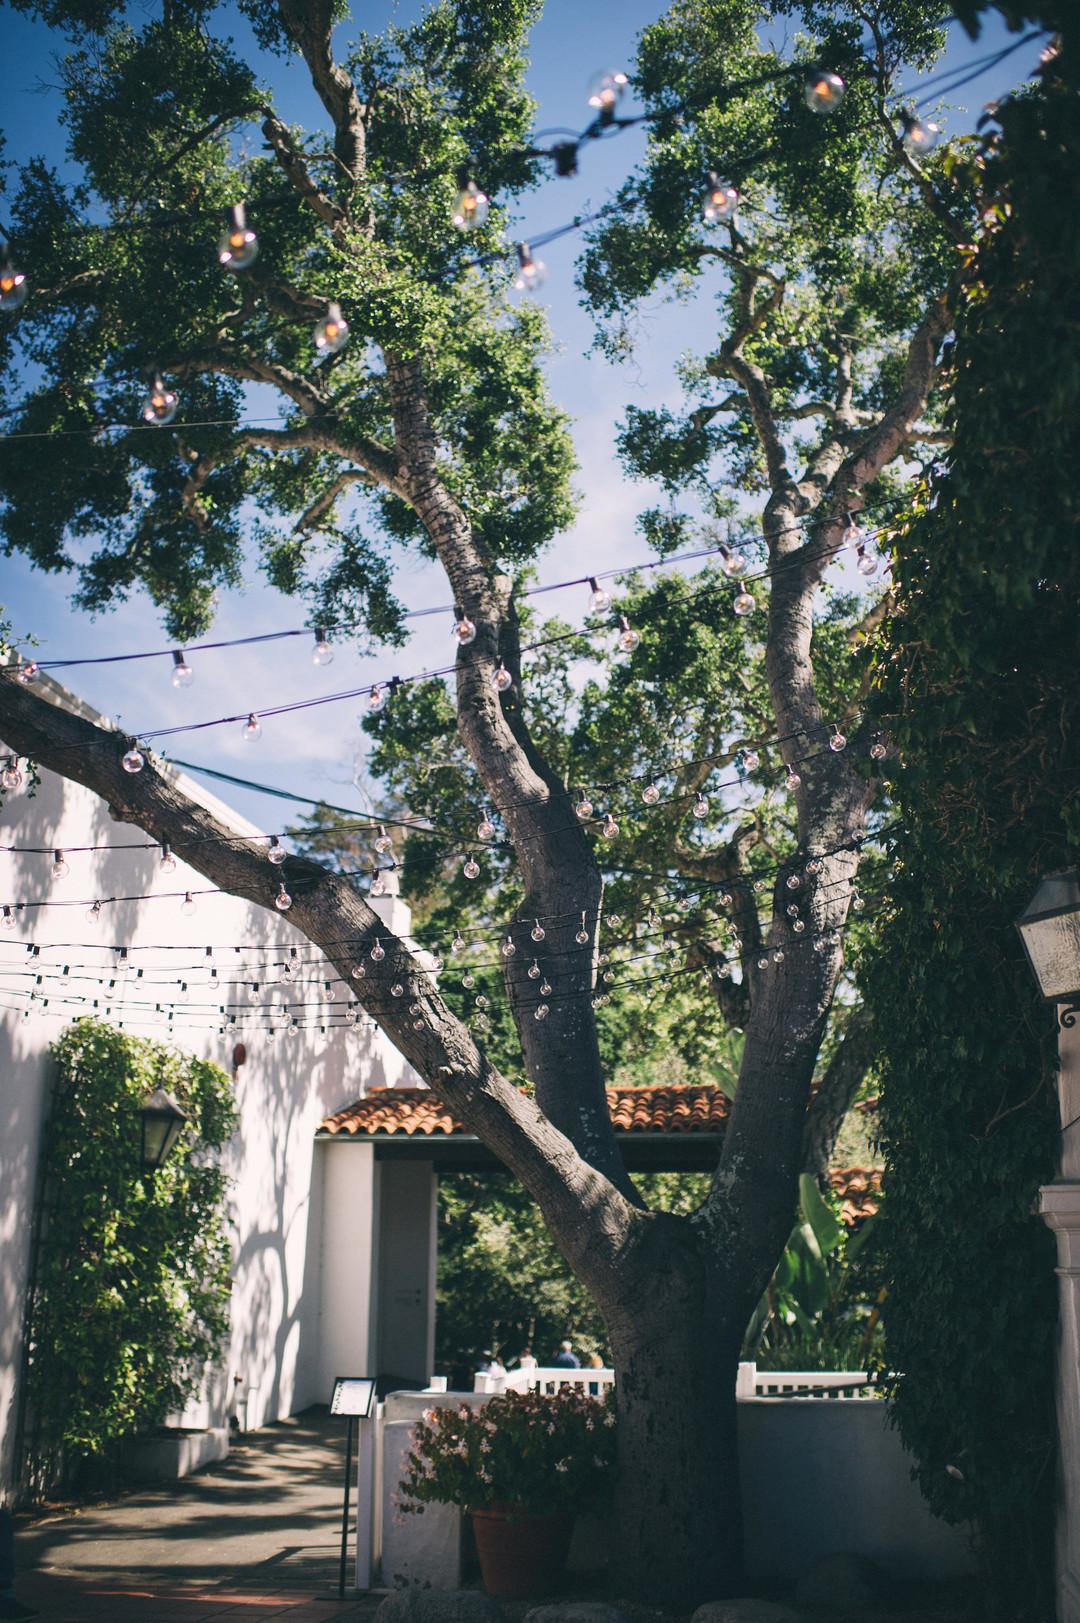 www.santabarbarawedding.com | Sarah Katherine Davis Photography | Santa Barbara Museum of Natural History | Wild Heart Events | Bright Event Rentals | Lights in the Trees